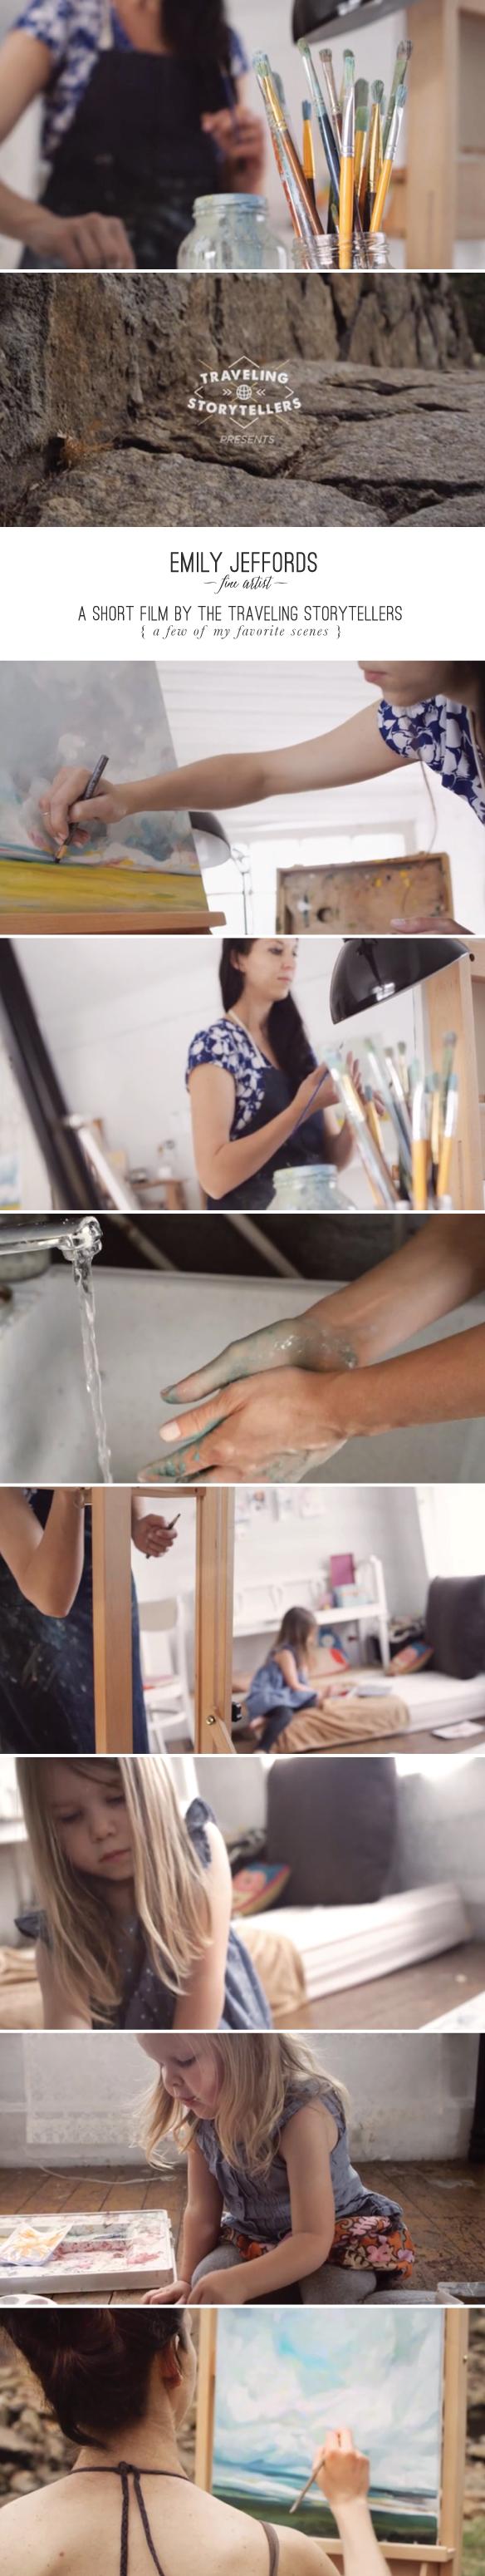 Emily Jeffords Studio: a Short Film by the Traveling Storytellers